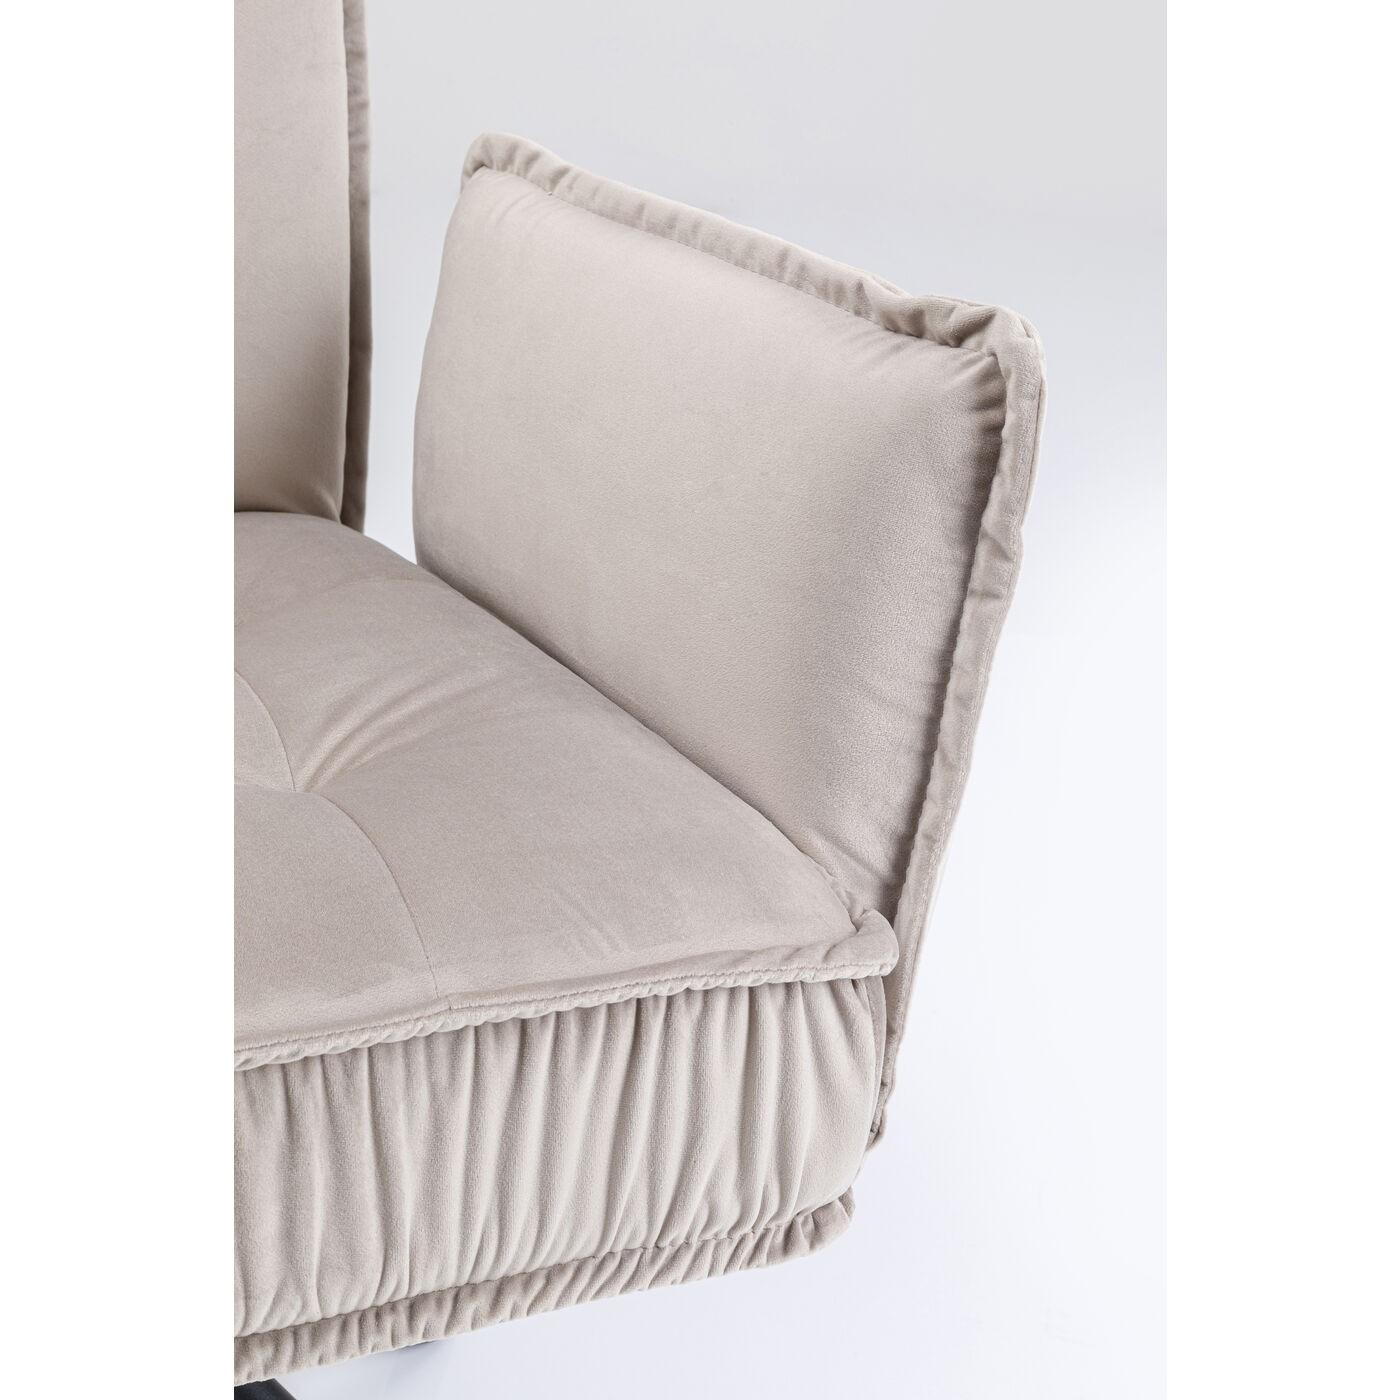 Chaise avec accoudoirs Chelsea grise Kare Design